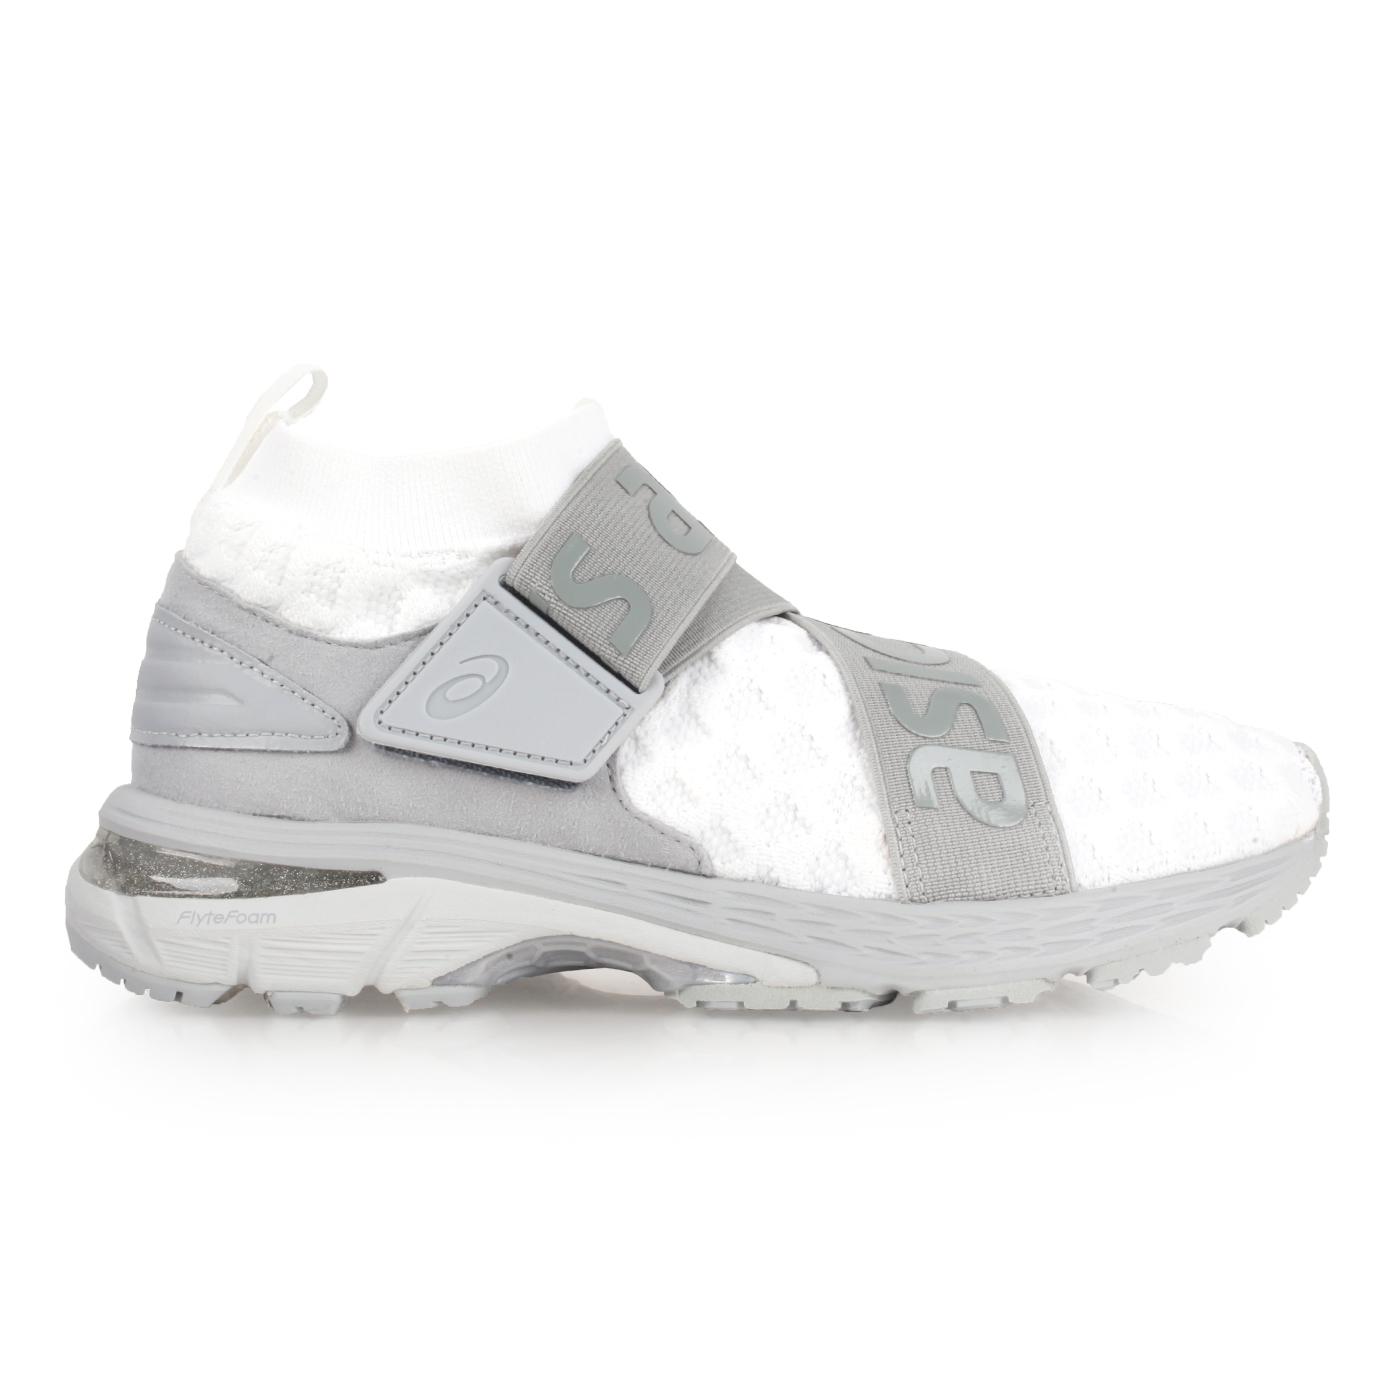 ASICS 女款慢跑鞋  @GEL-KAYANO 25 OBI@1022A028-100 - 白灰